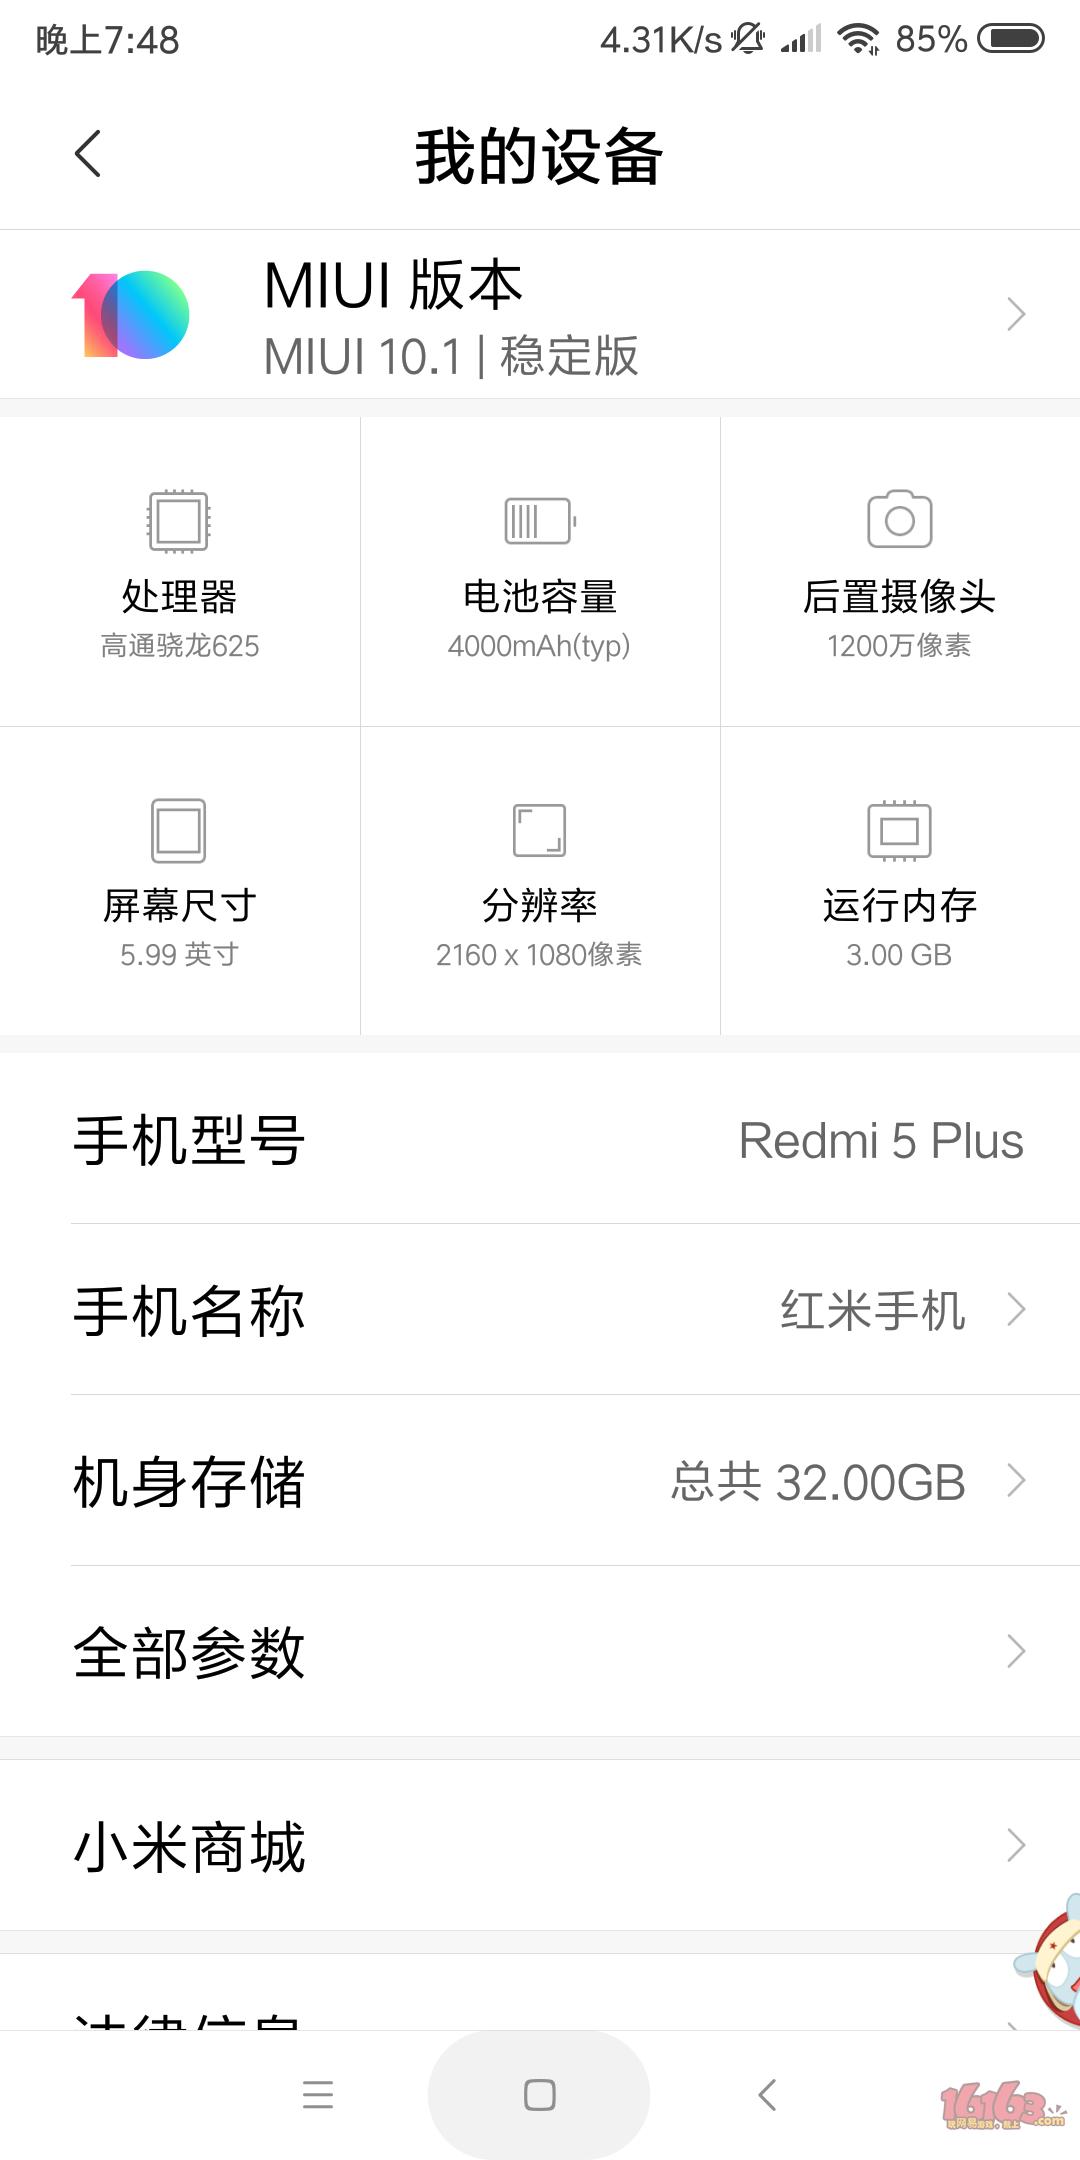 Screenshot_2018-11-06-19-48-11-324_com.android.settings.png